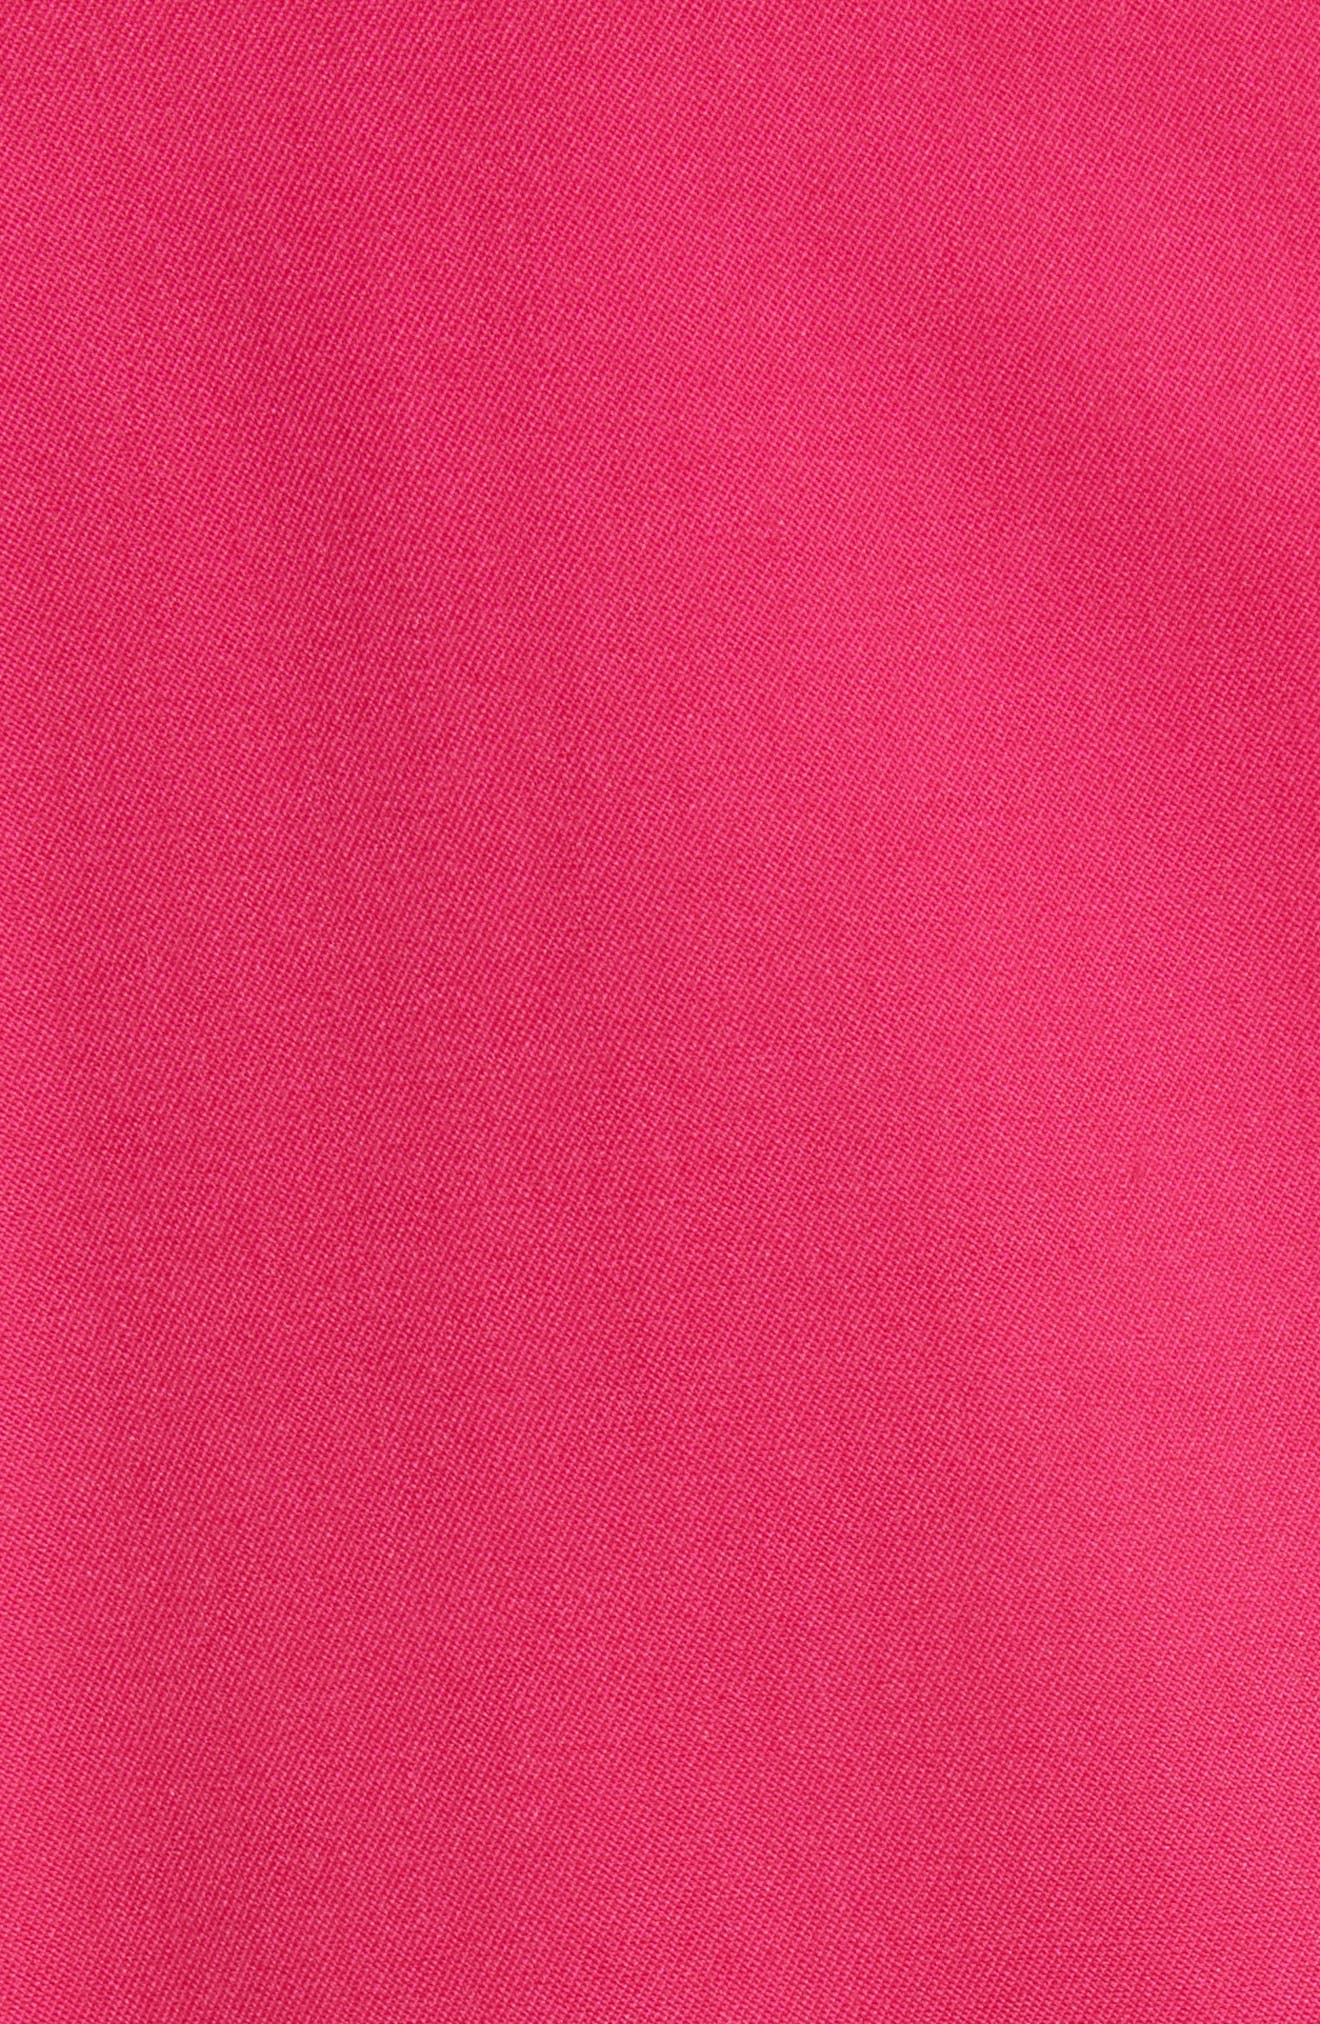 Alternate Image 3  - Stella McCartney Double Breasted Blazer